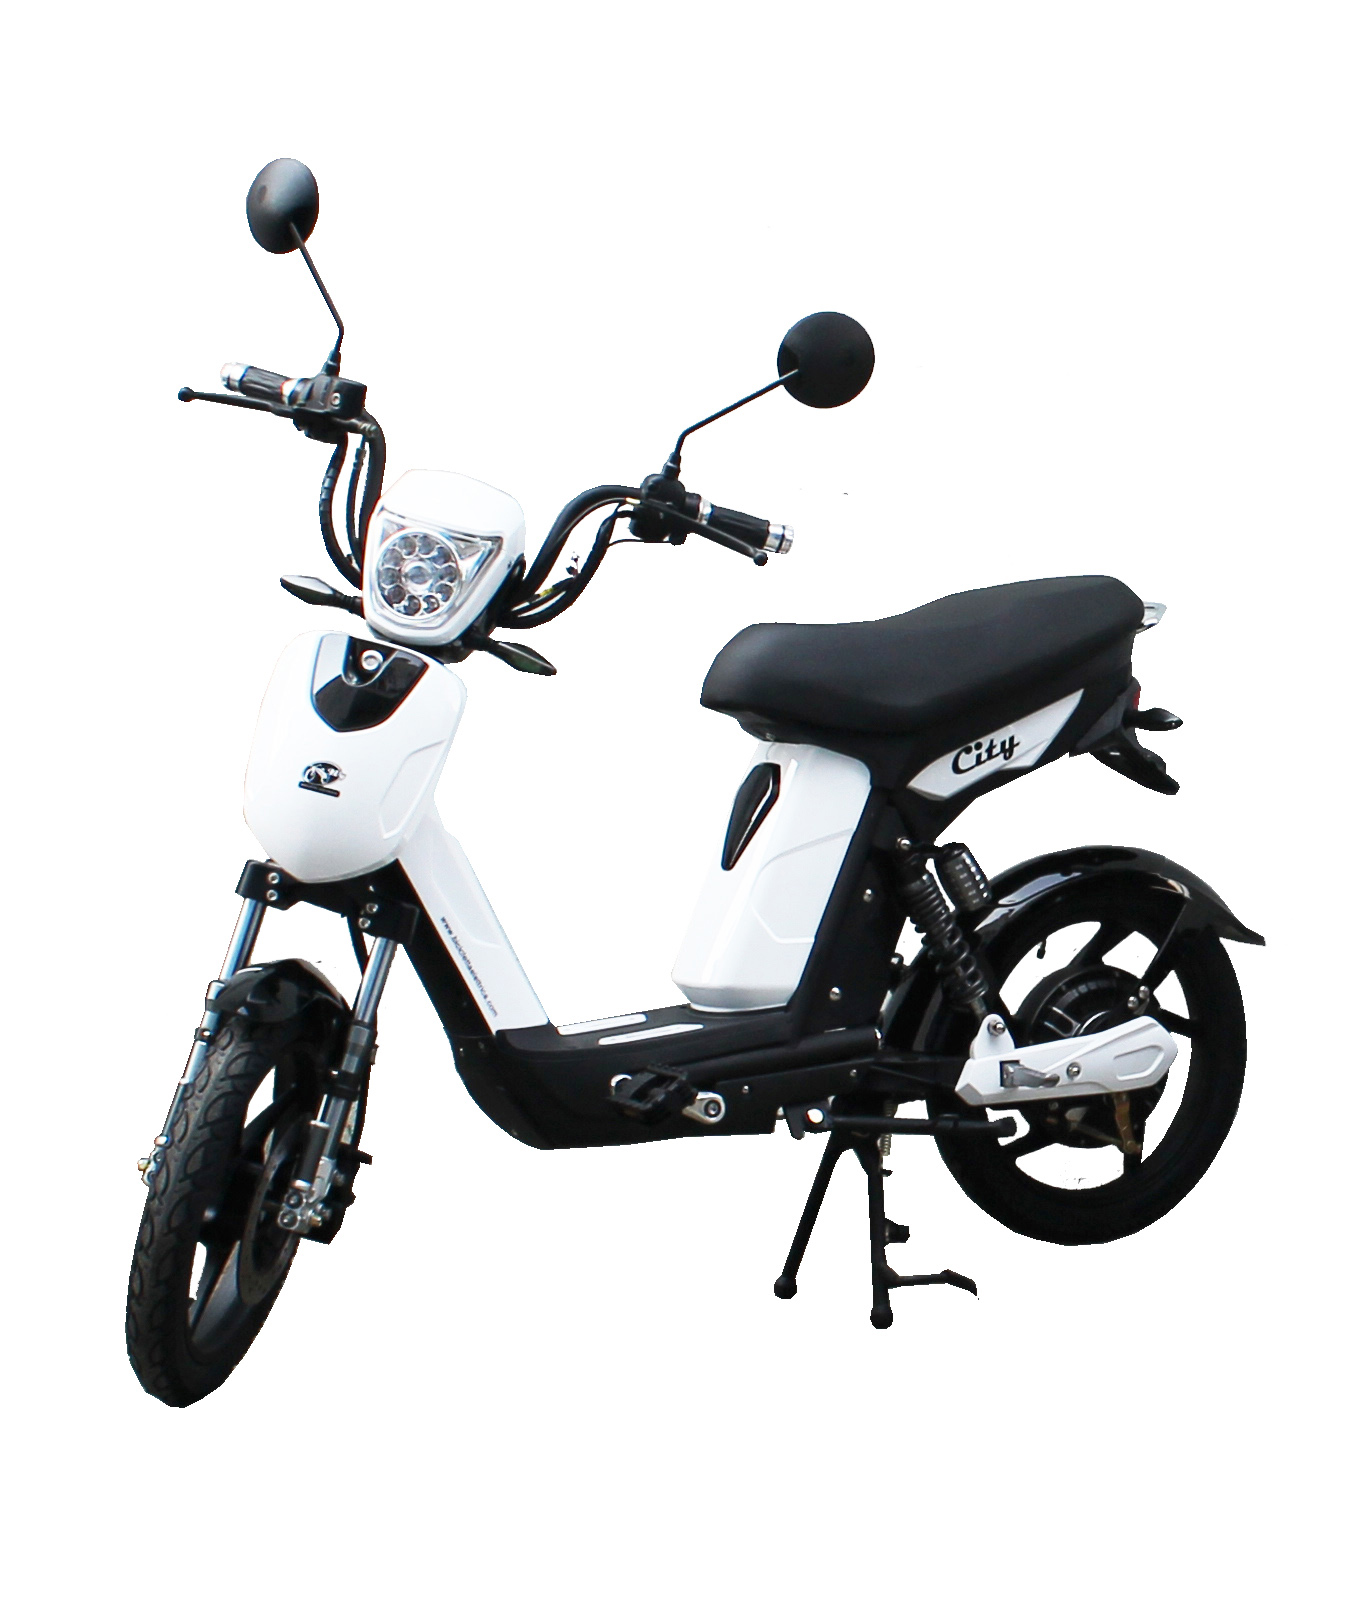 Bici E-Bike / E-Fahrrad Elektrofahrrad City weiß Bild 1